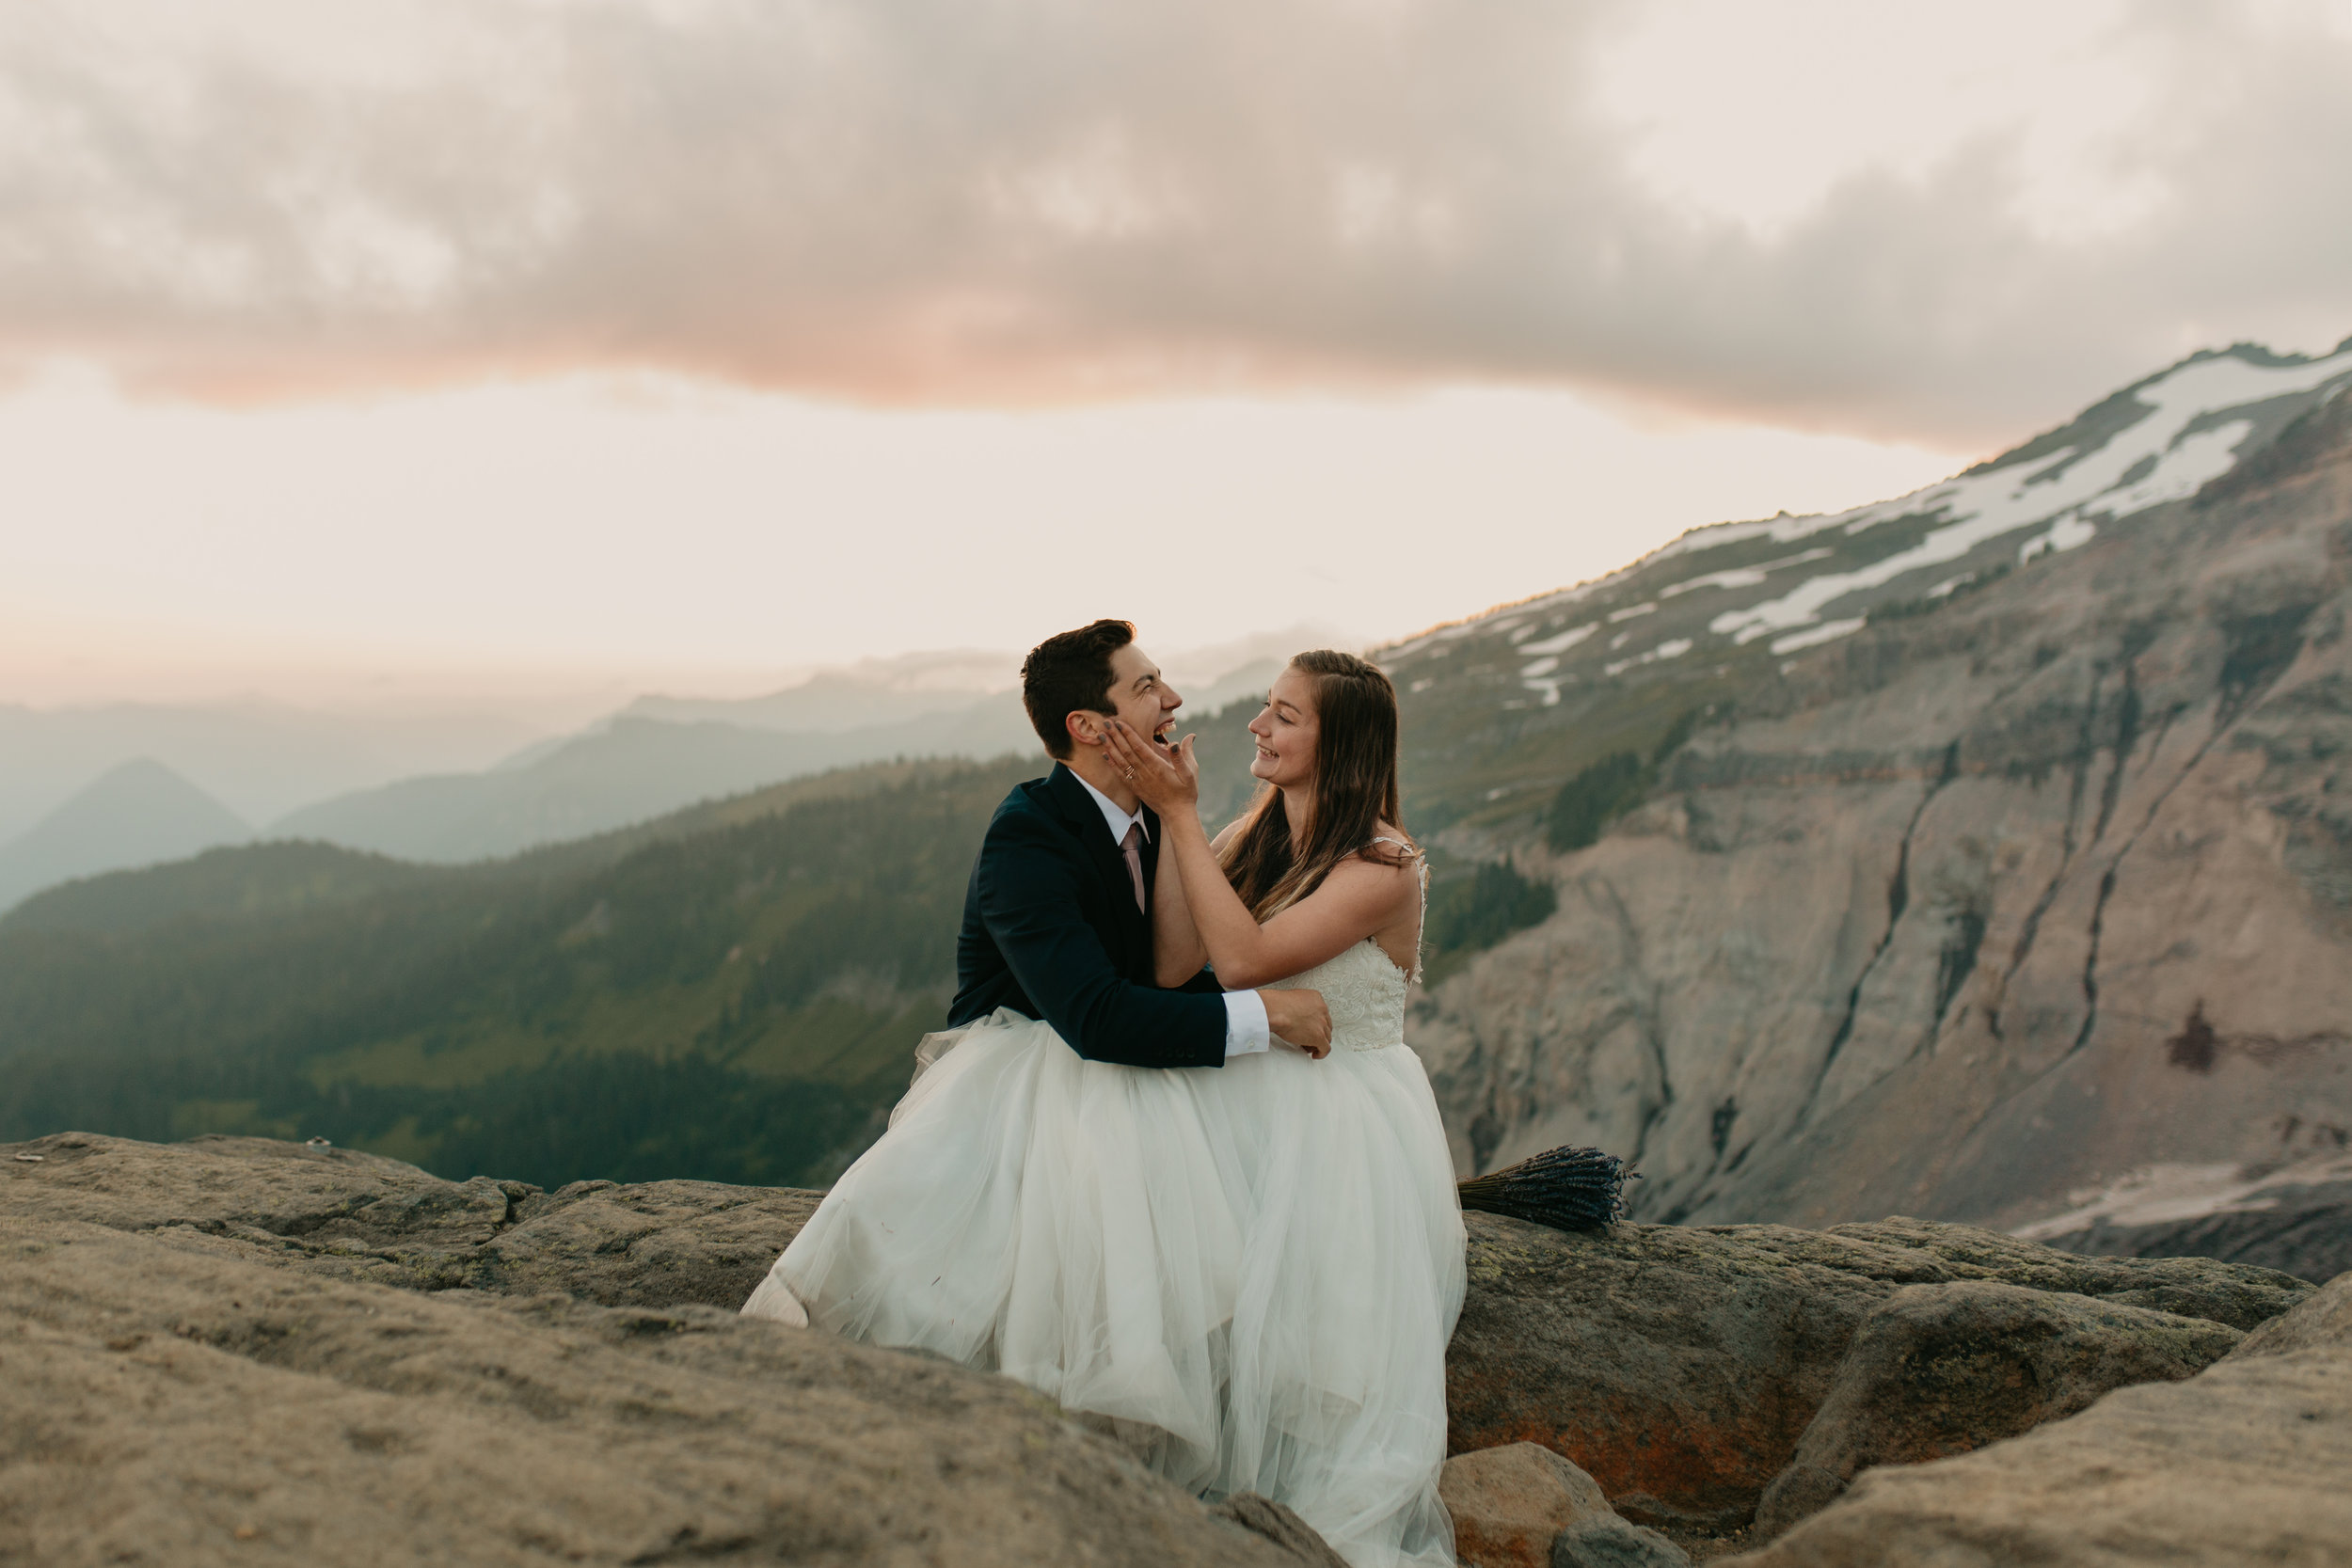 Nicole-Daacke-Photography-Mt-Rainier-elopement-photographer-washington-mountain-epic-wedding-photography-wildflowers-at-rainier-pine-tree-cloudy-summer-day-at-mountain-rainier-58.jpg